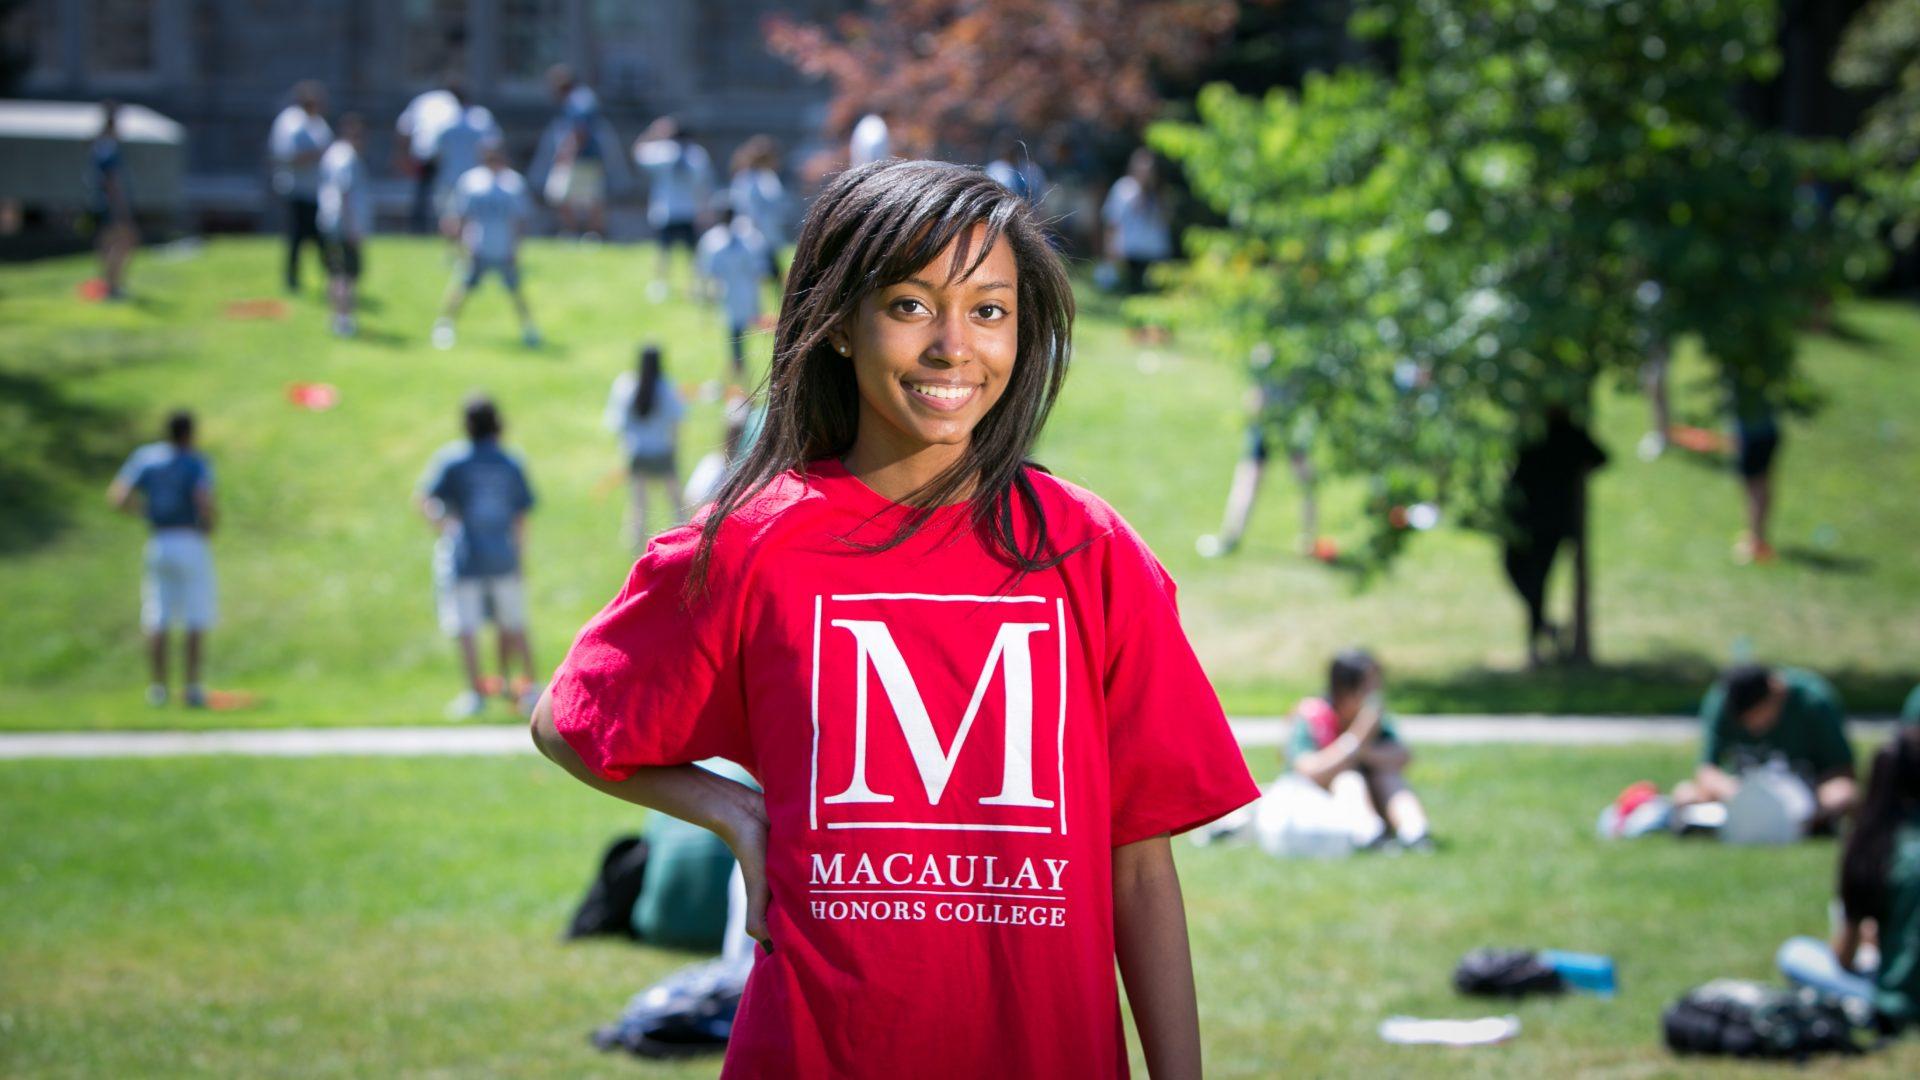 Student wearing Macaulay Honors t-shirt